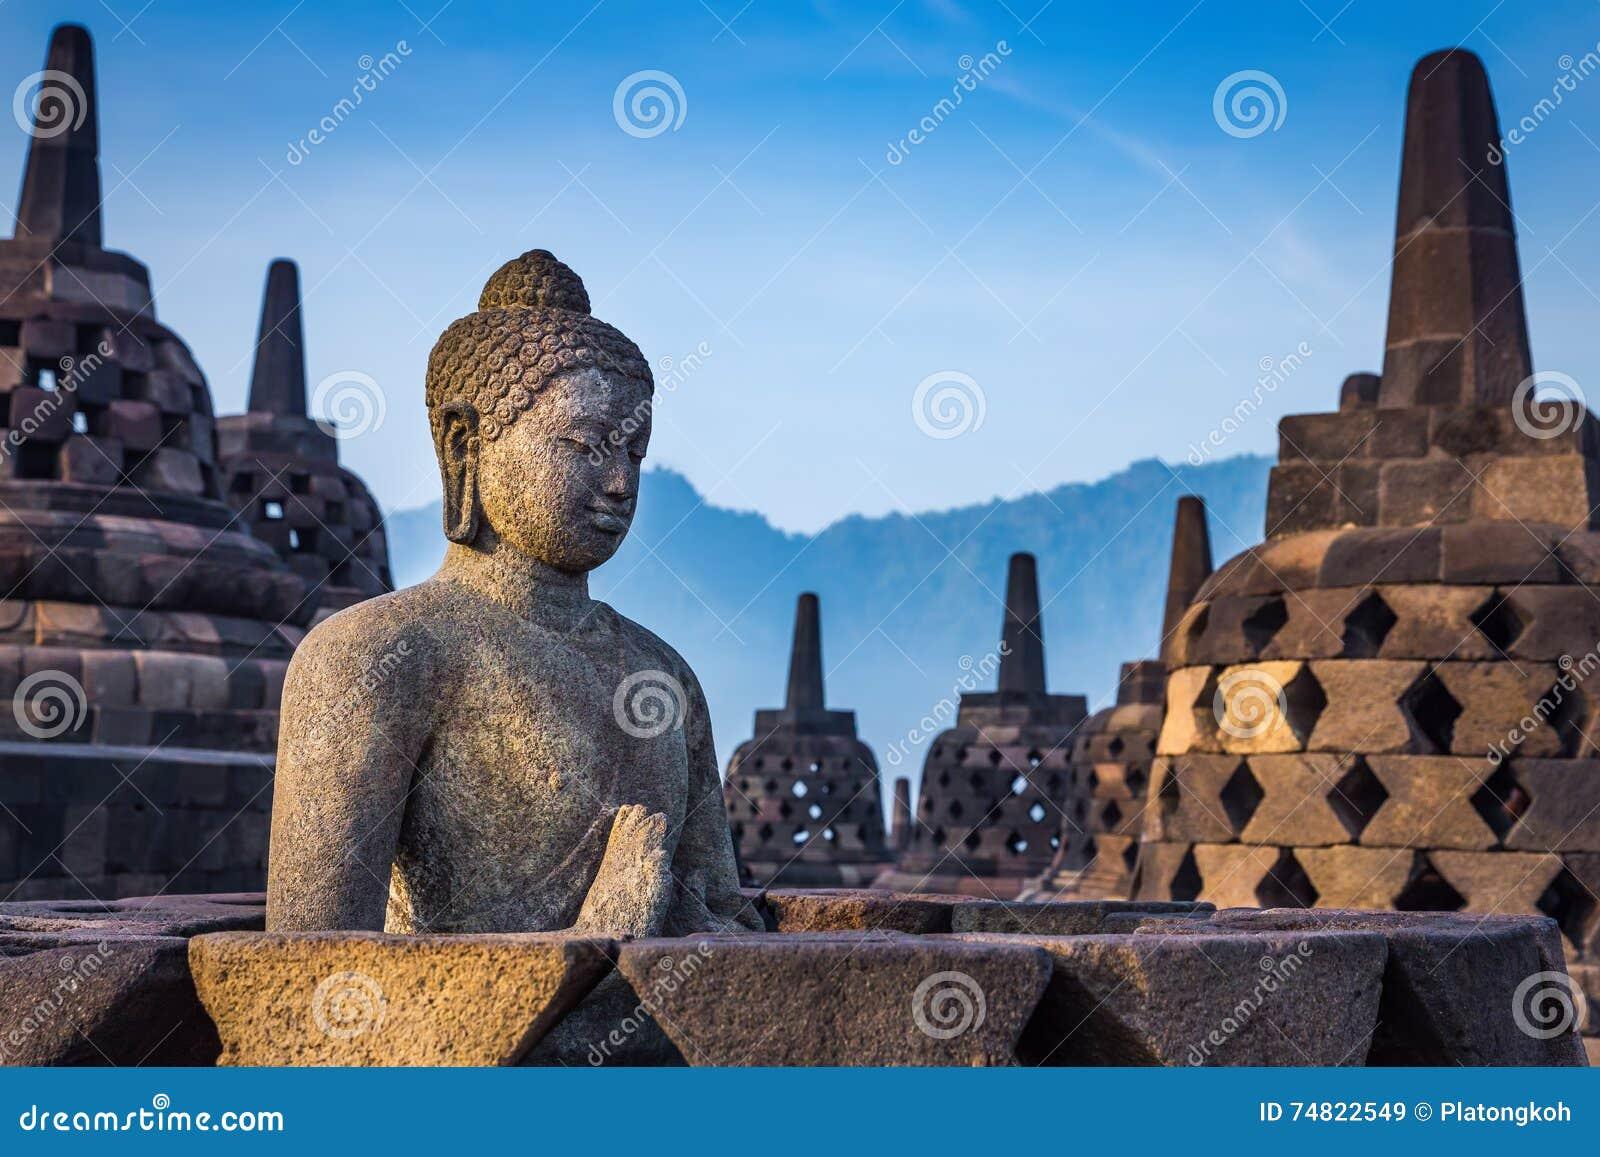 Statua di Buddha in tempio di Borobudur, Indonesia